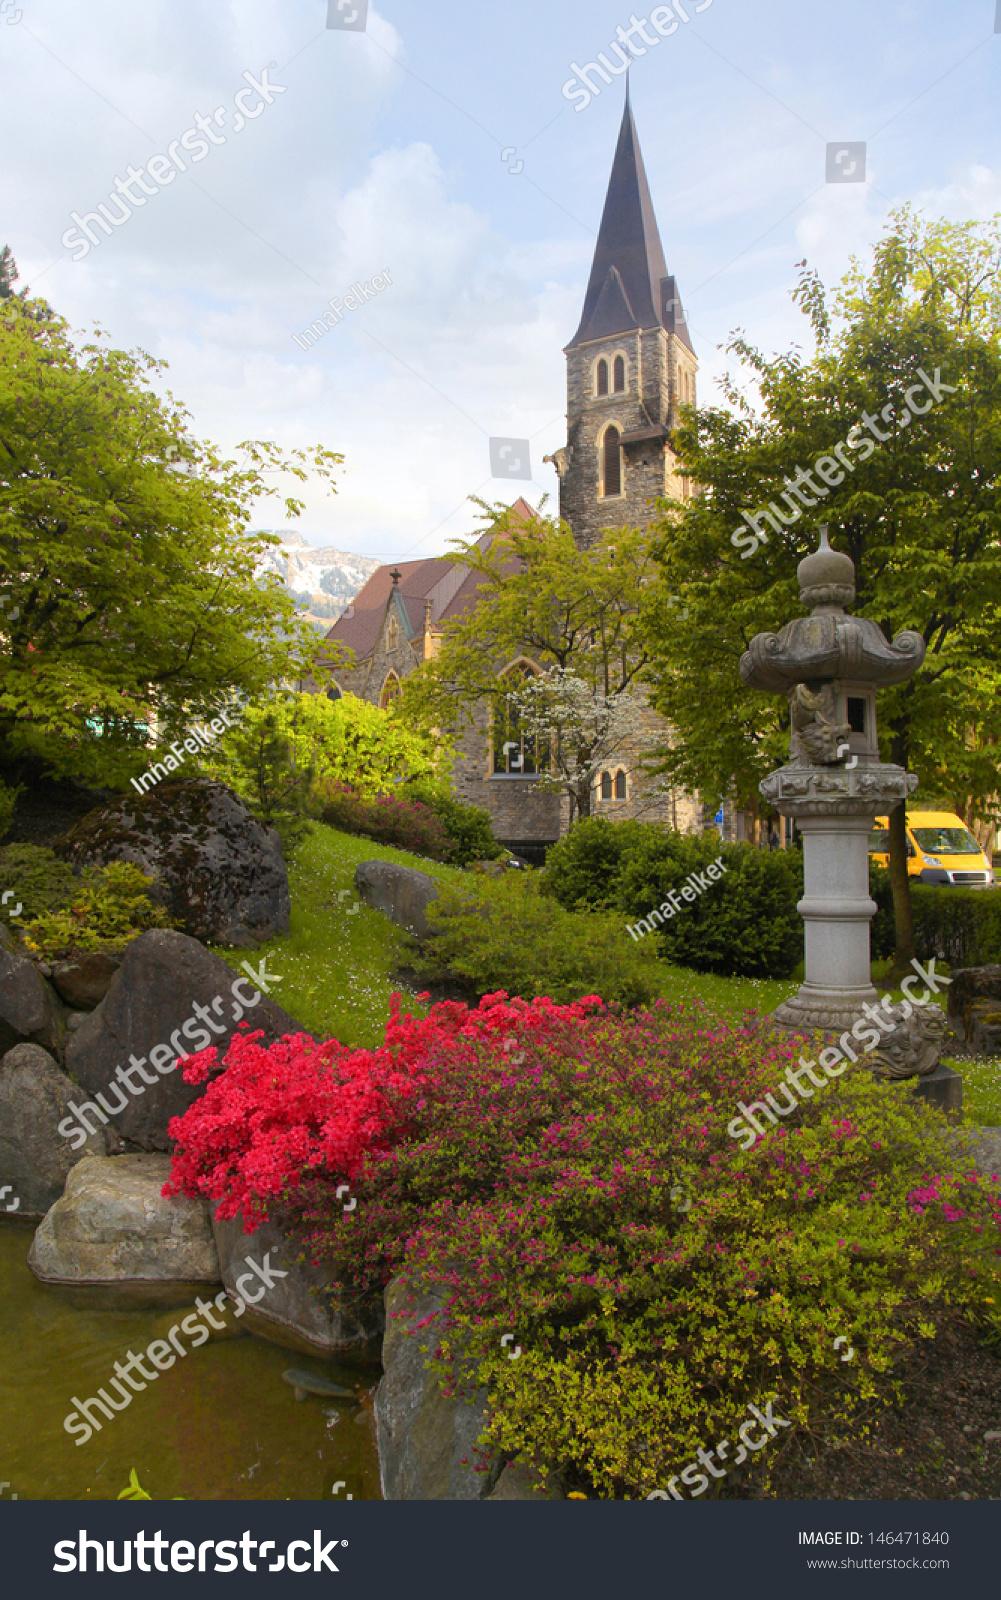 A Beautiful Church And Japanese Garden In Interlaken